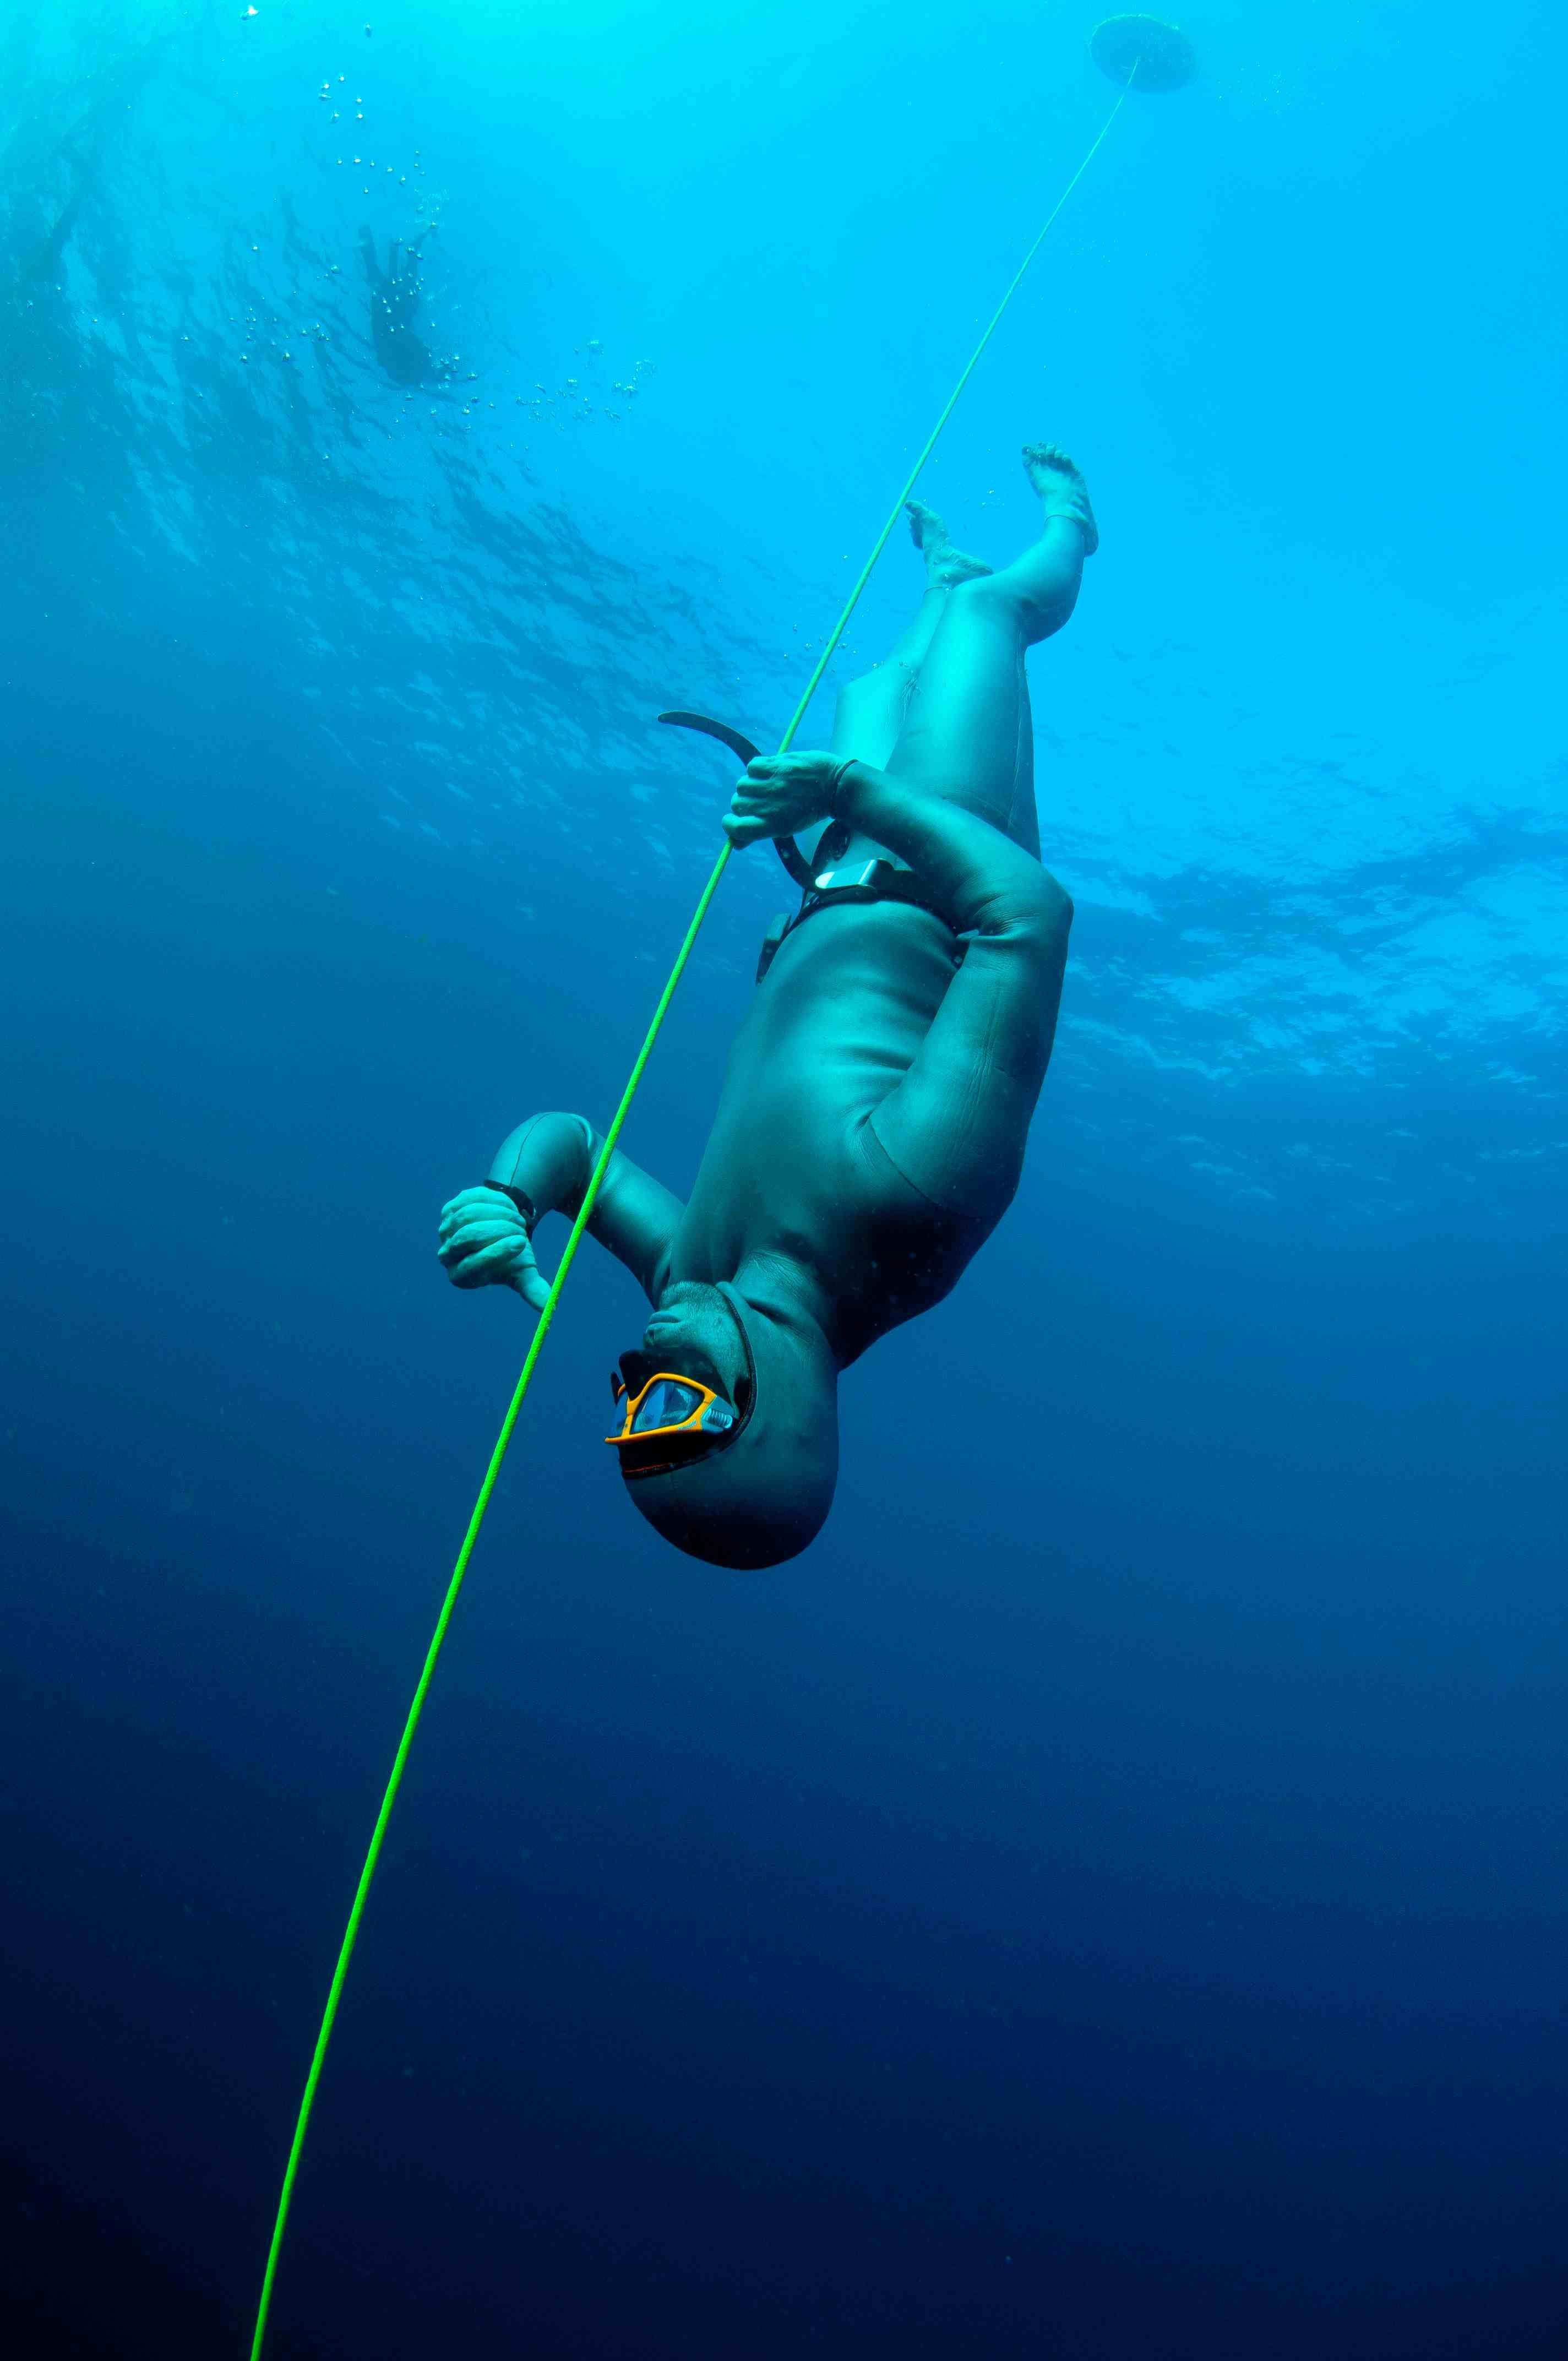 Diving Free Scuba Diving 2848x4288